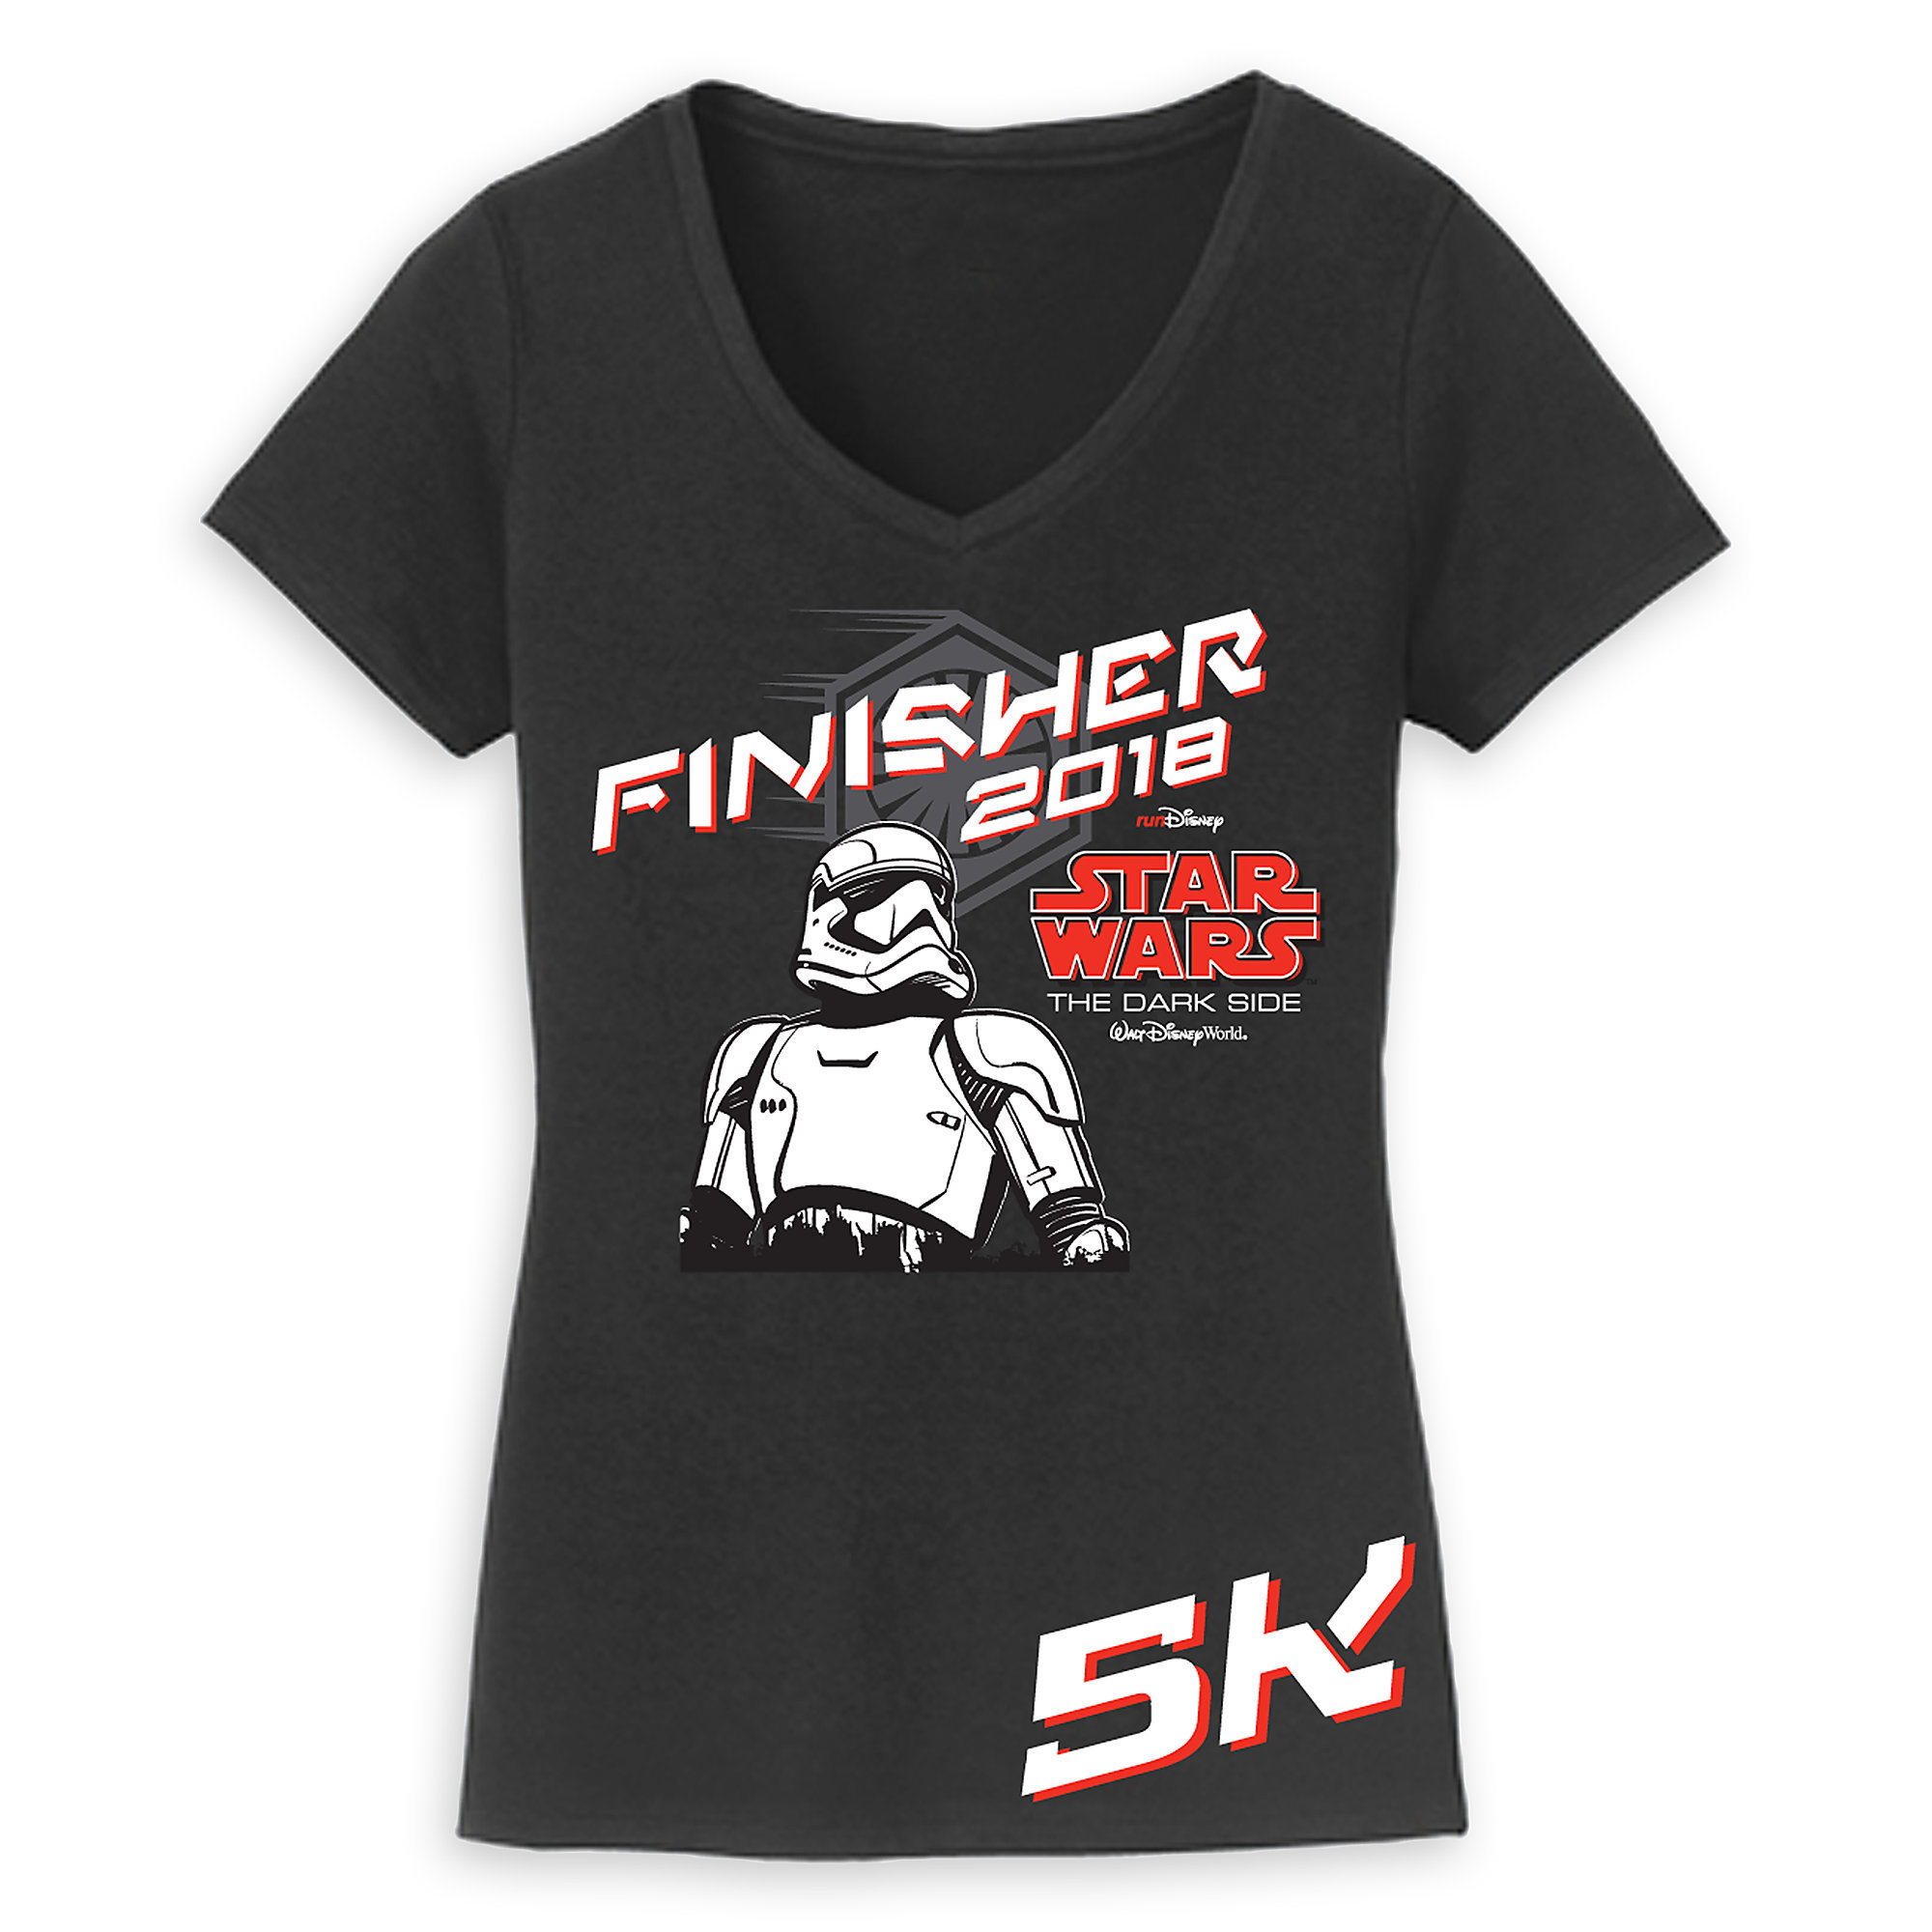 Women's Run Disney Star Wars Dark Side Finisher Apparel Collection at Shop Disney